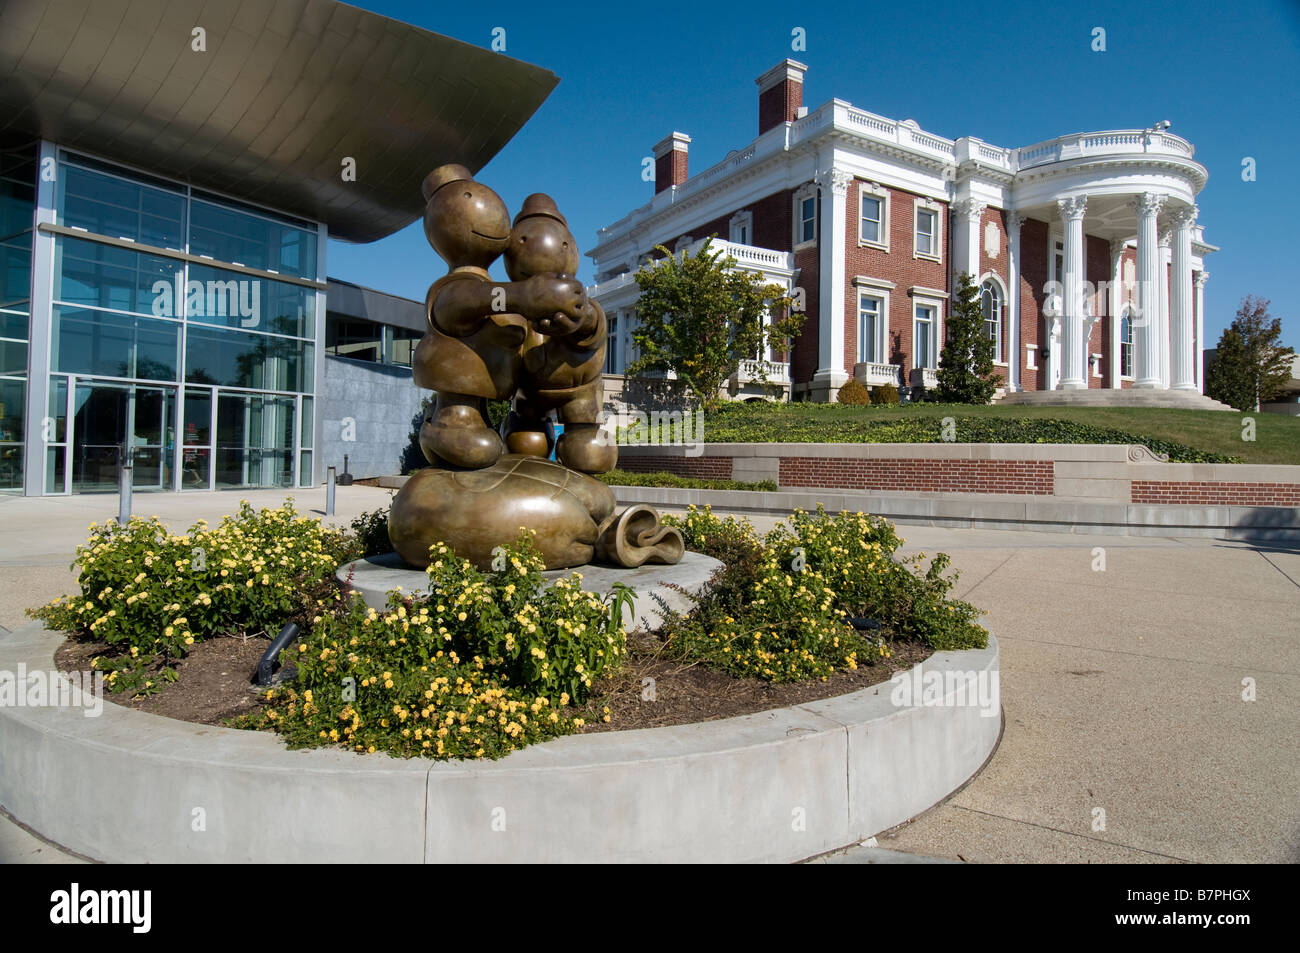 "Skulptur mit dem Titel ""Free Money"" vor der Hunter Museum of American Art Chattanooga Tennessee Stockbild"